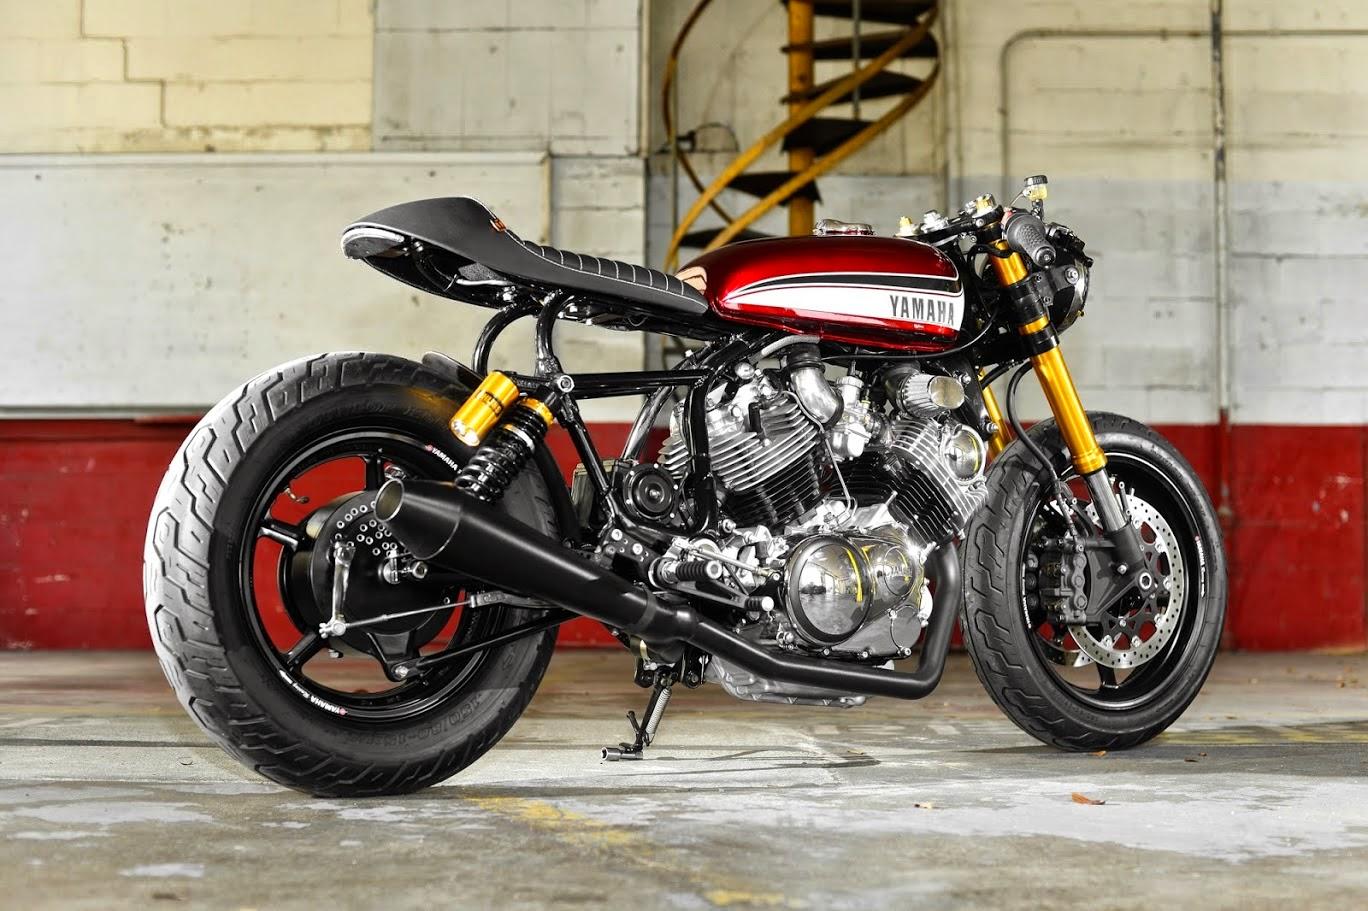 racing caf yamaha xv 750 virago by hageman motorcycles. Black Bedroom Furniture Sets. Home Design Ideas